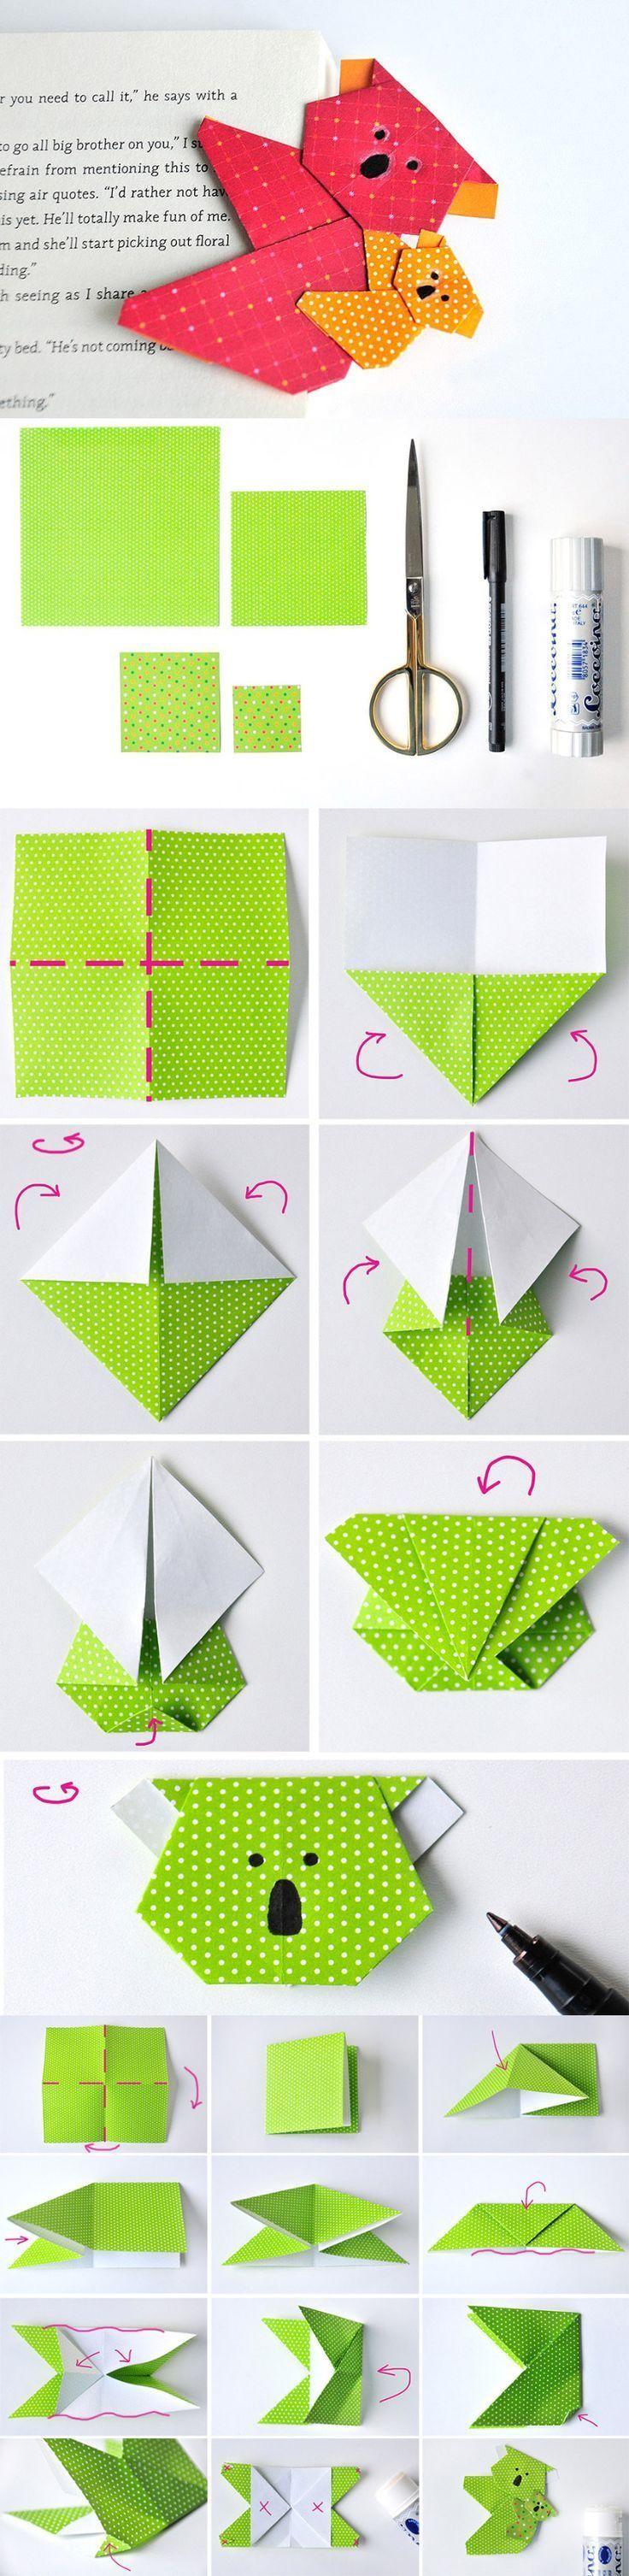 DIY Koala Origami – Bookmark